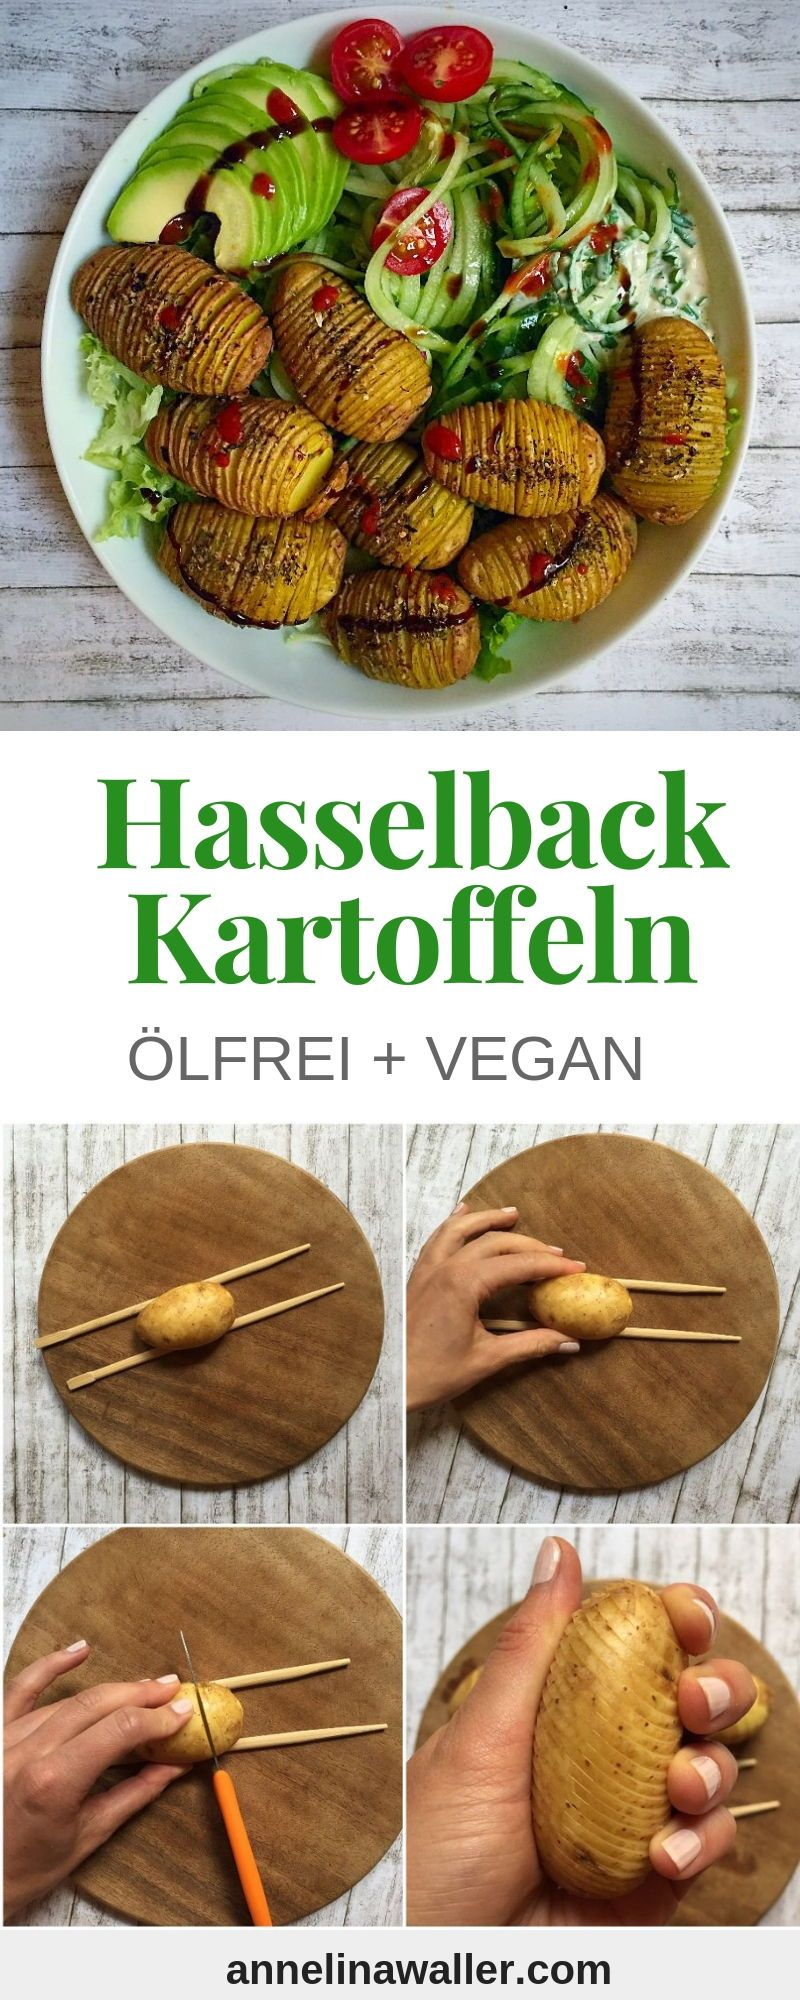 Ölfreie Hasselback Kartoffeln mit Aquafaba